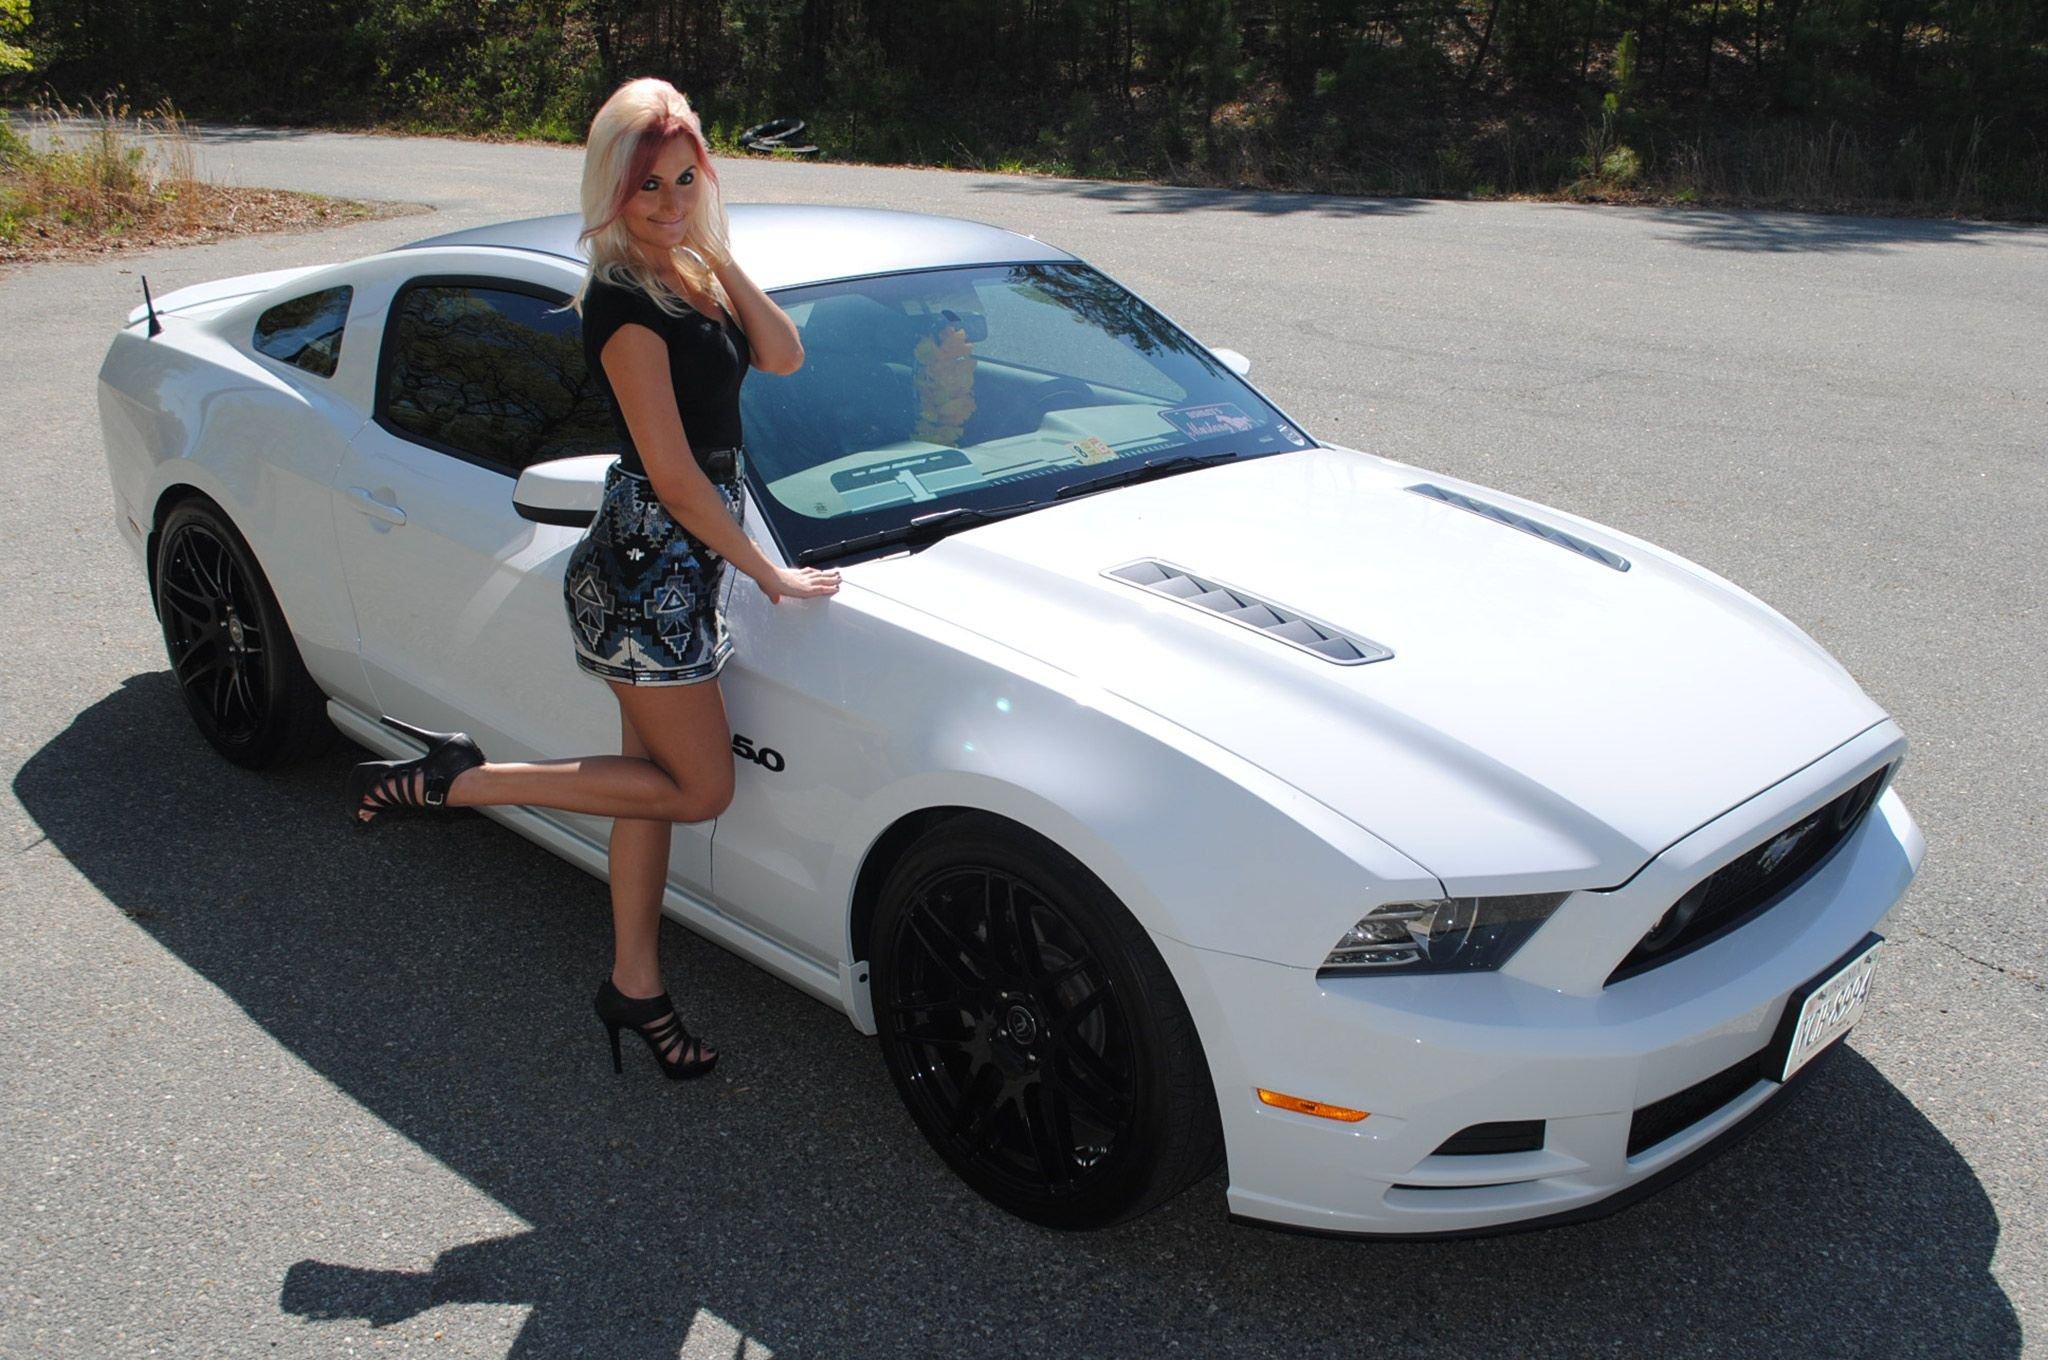 Ford Mustang Supercar Superstreet Ashley Arrington Babe Girl